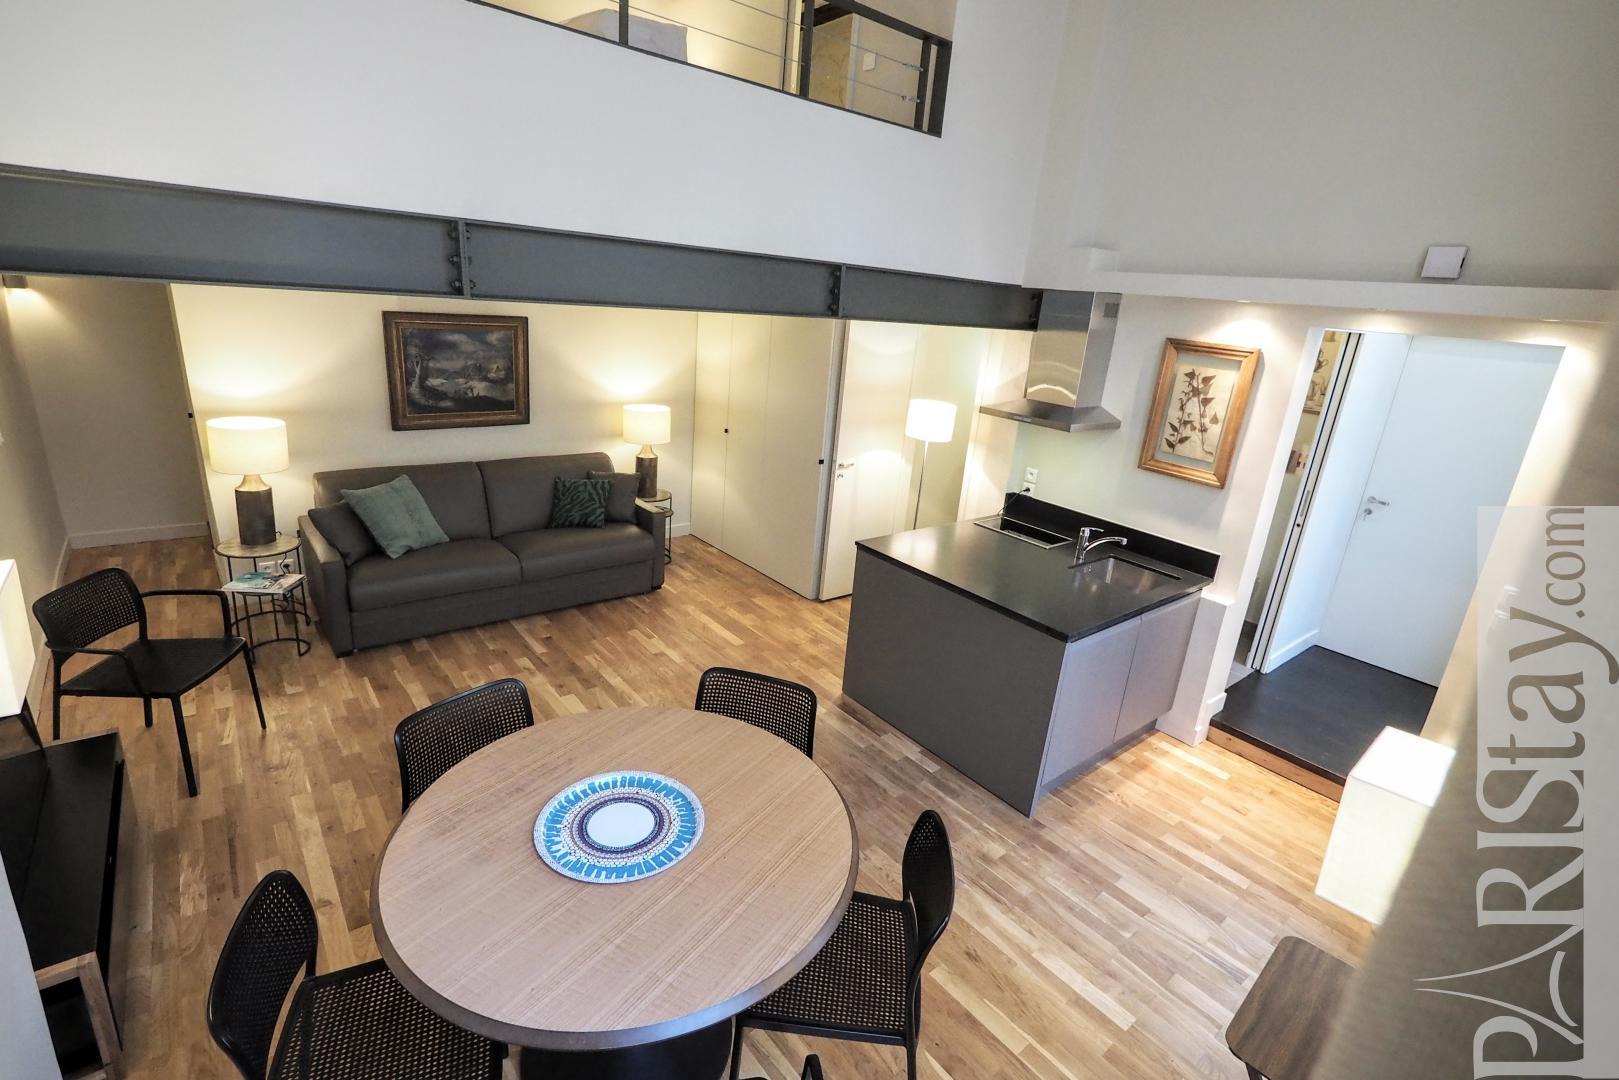 Apartment rental paris france furnished 2 bedroom Louvre ...